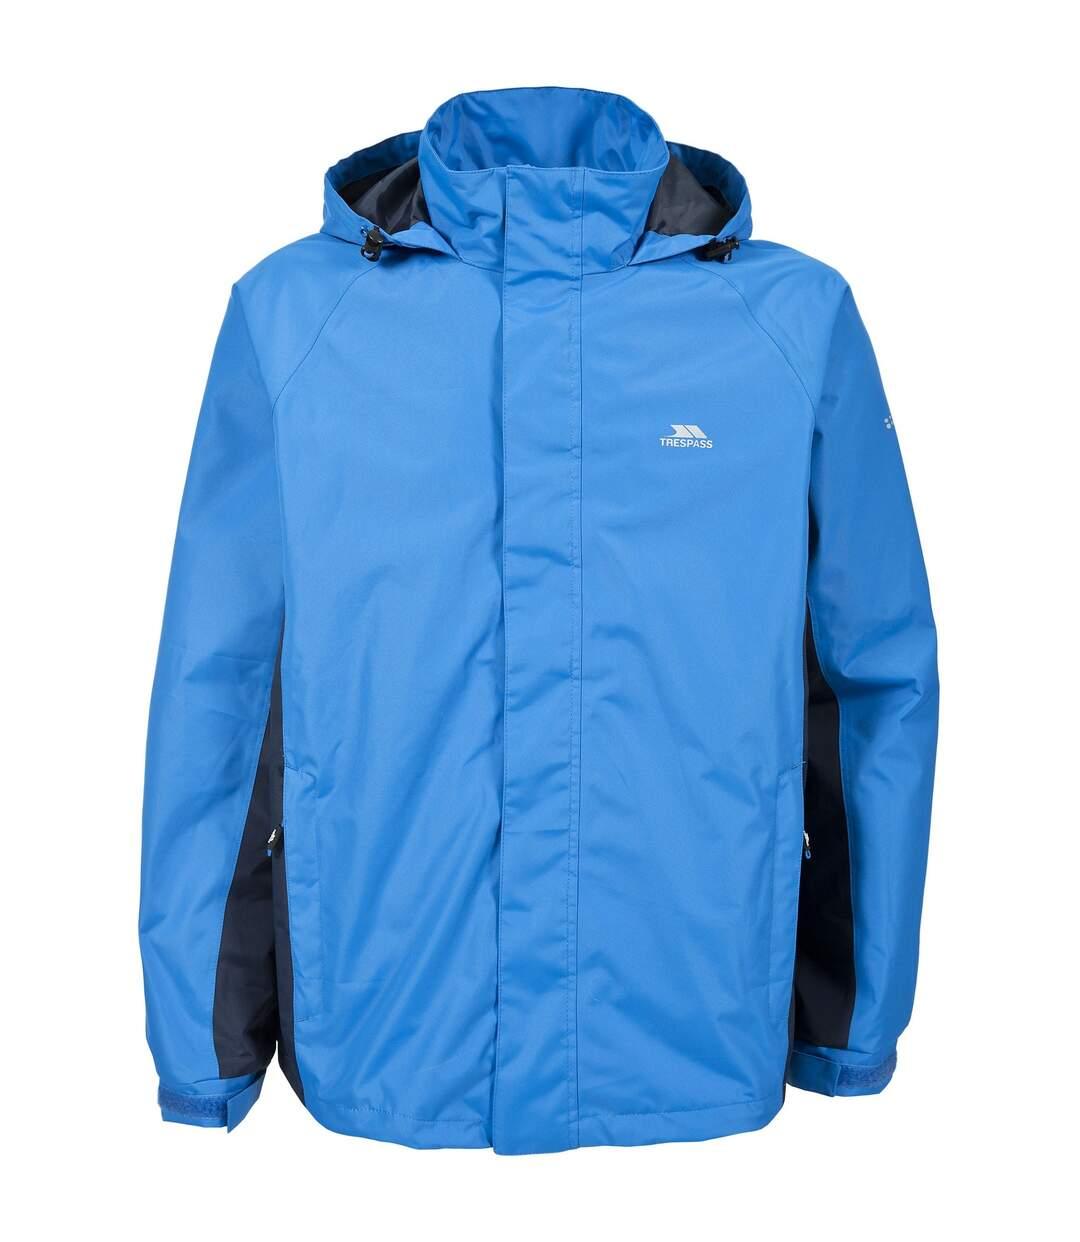 Trespass Mens Rogan II Waterproof Jacket (Bright Blue) - UTTP3333